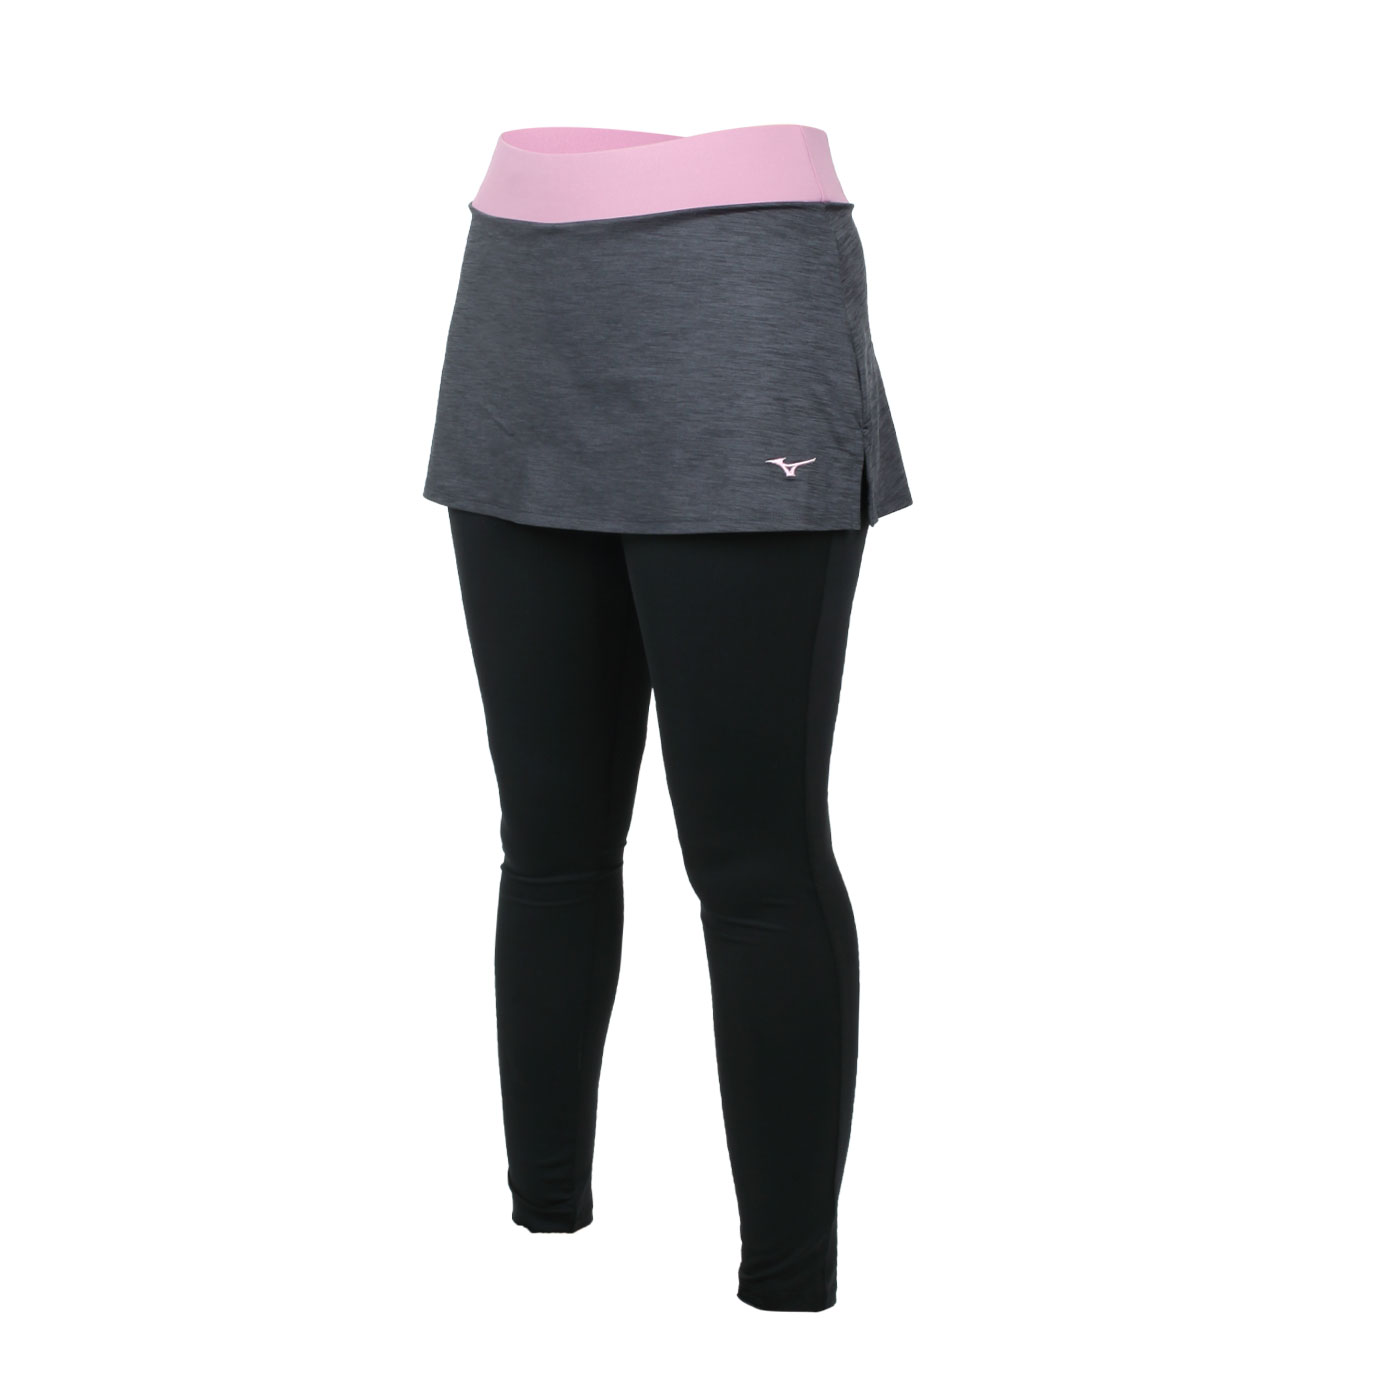 MIZUNO 女款緊身褲裙 K2TB120709 - 黑灰粉